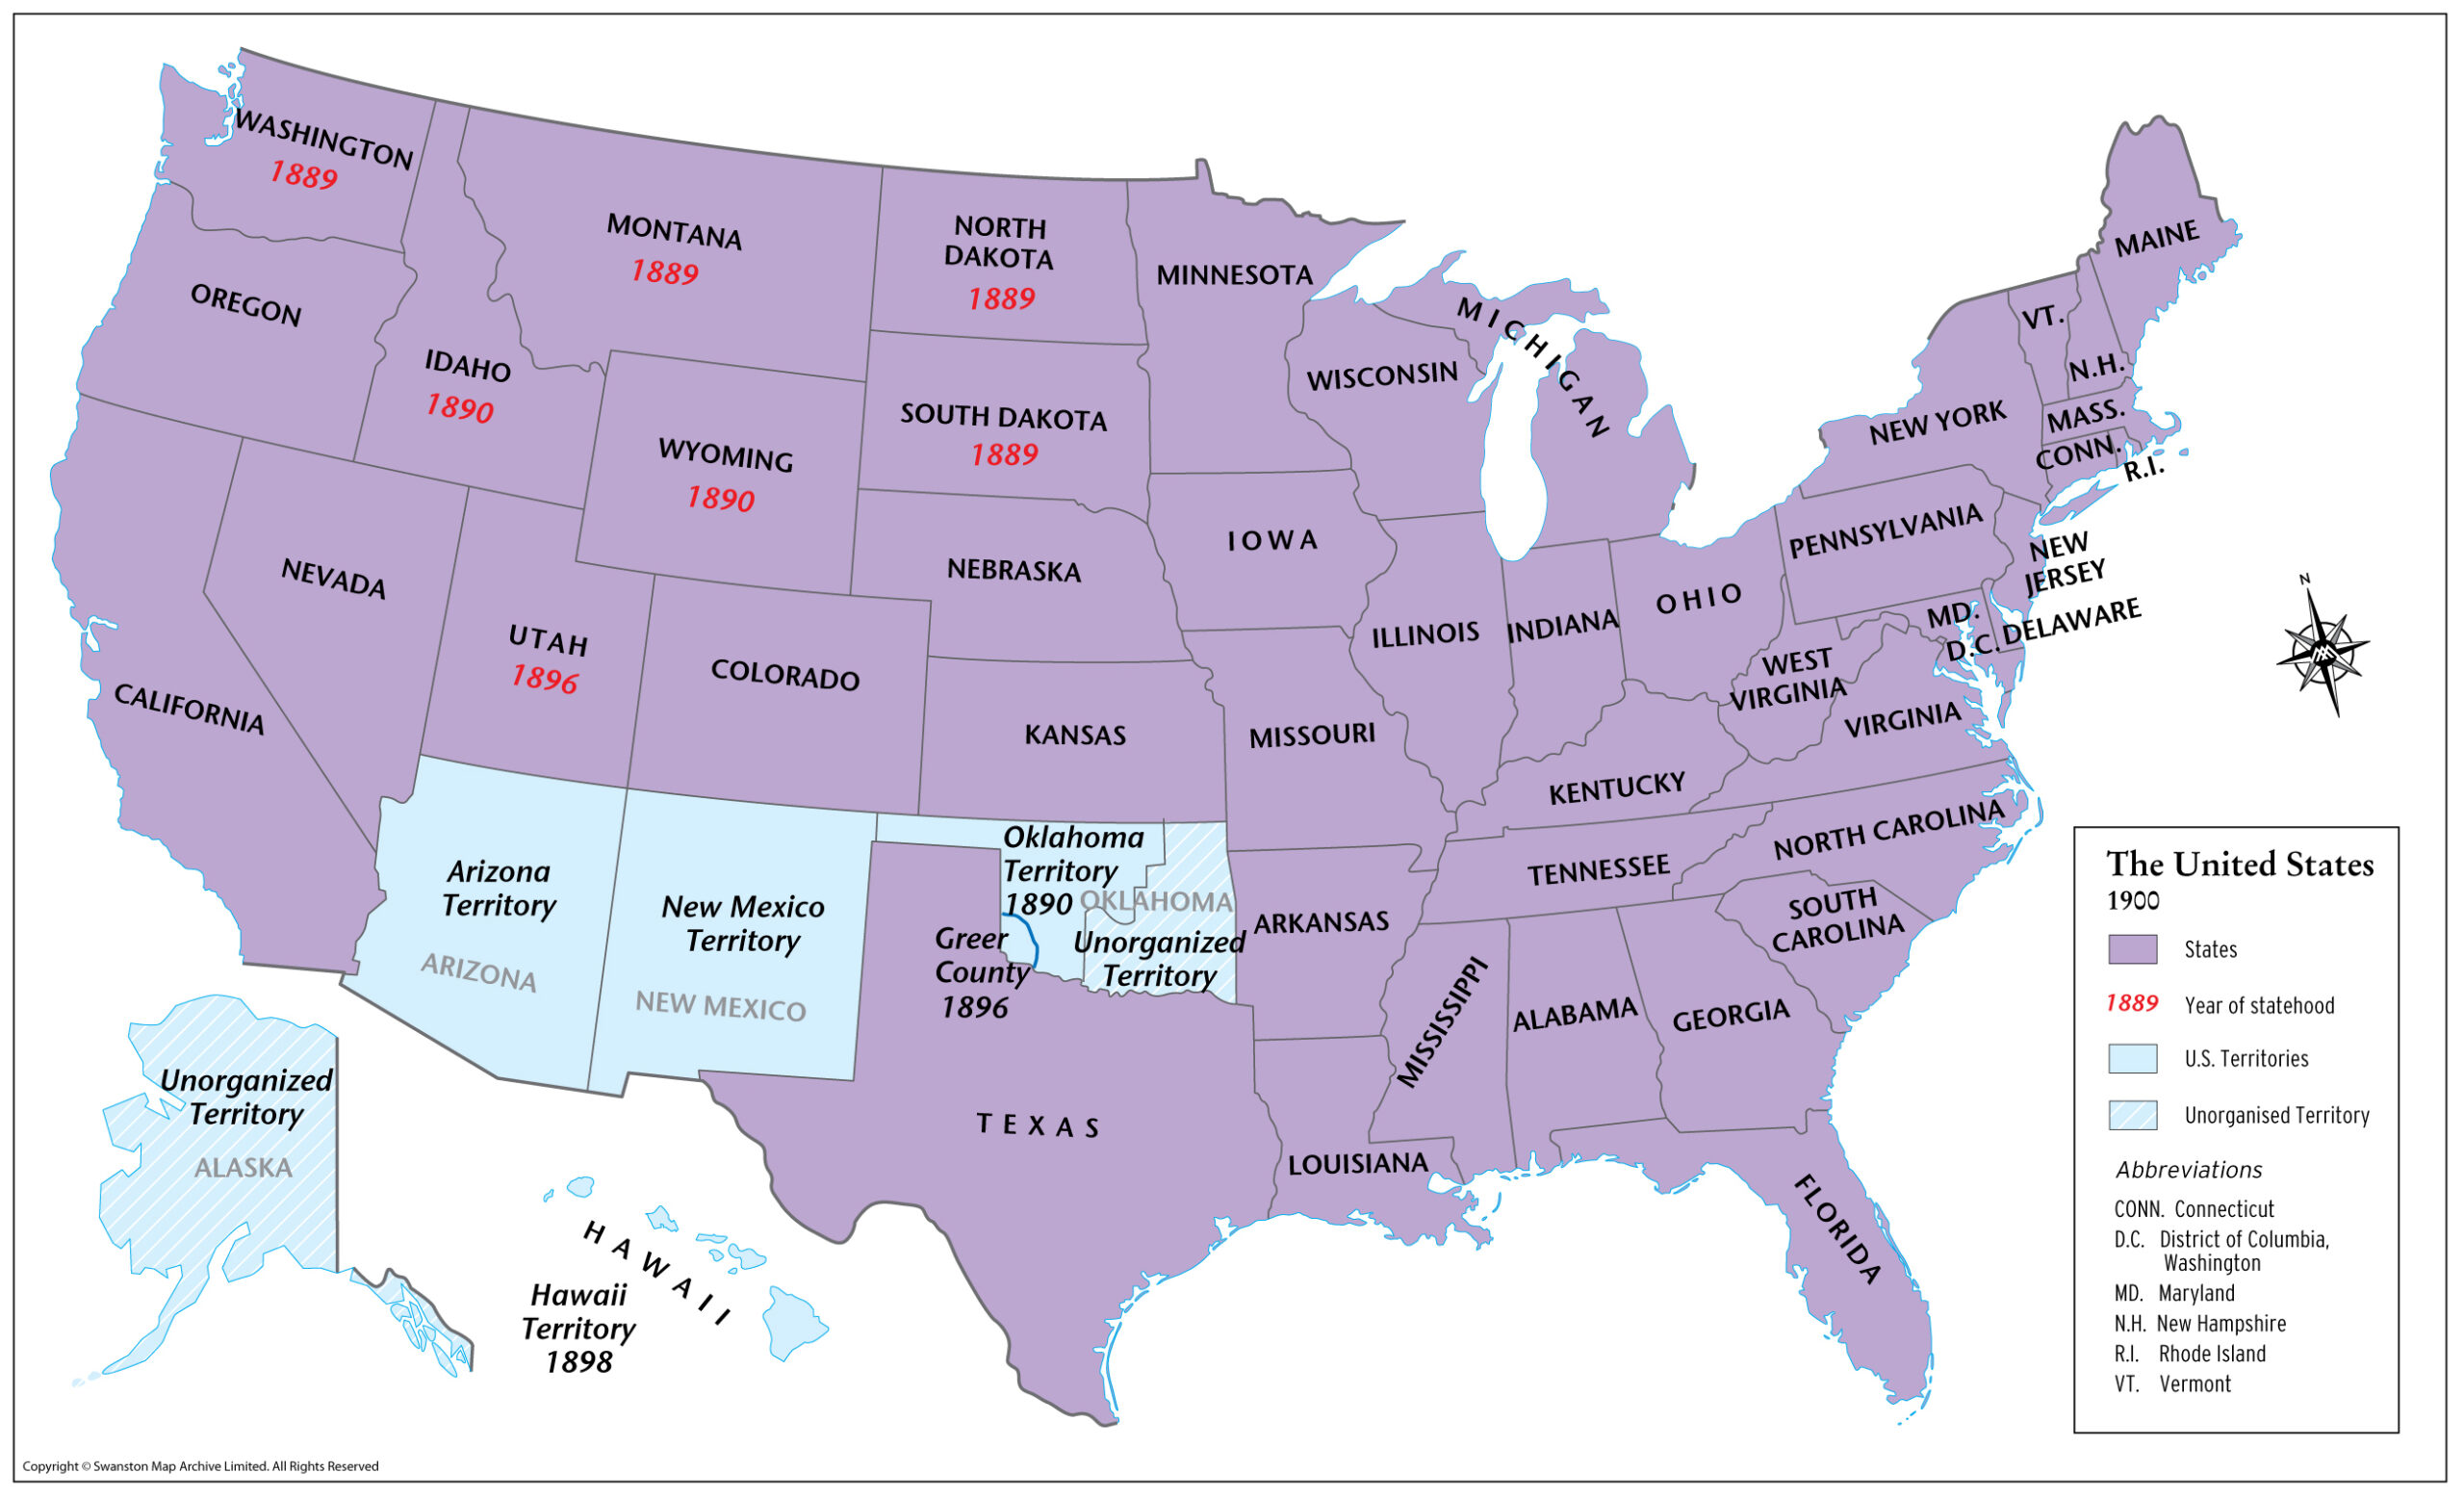 United States 1900